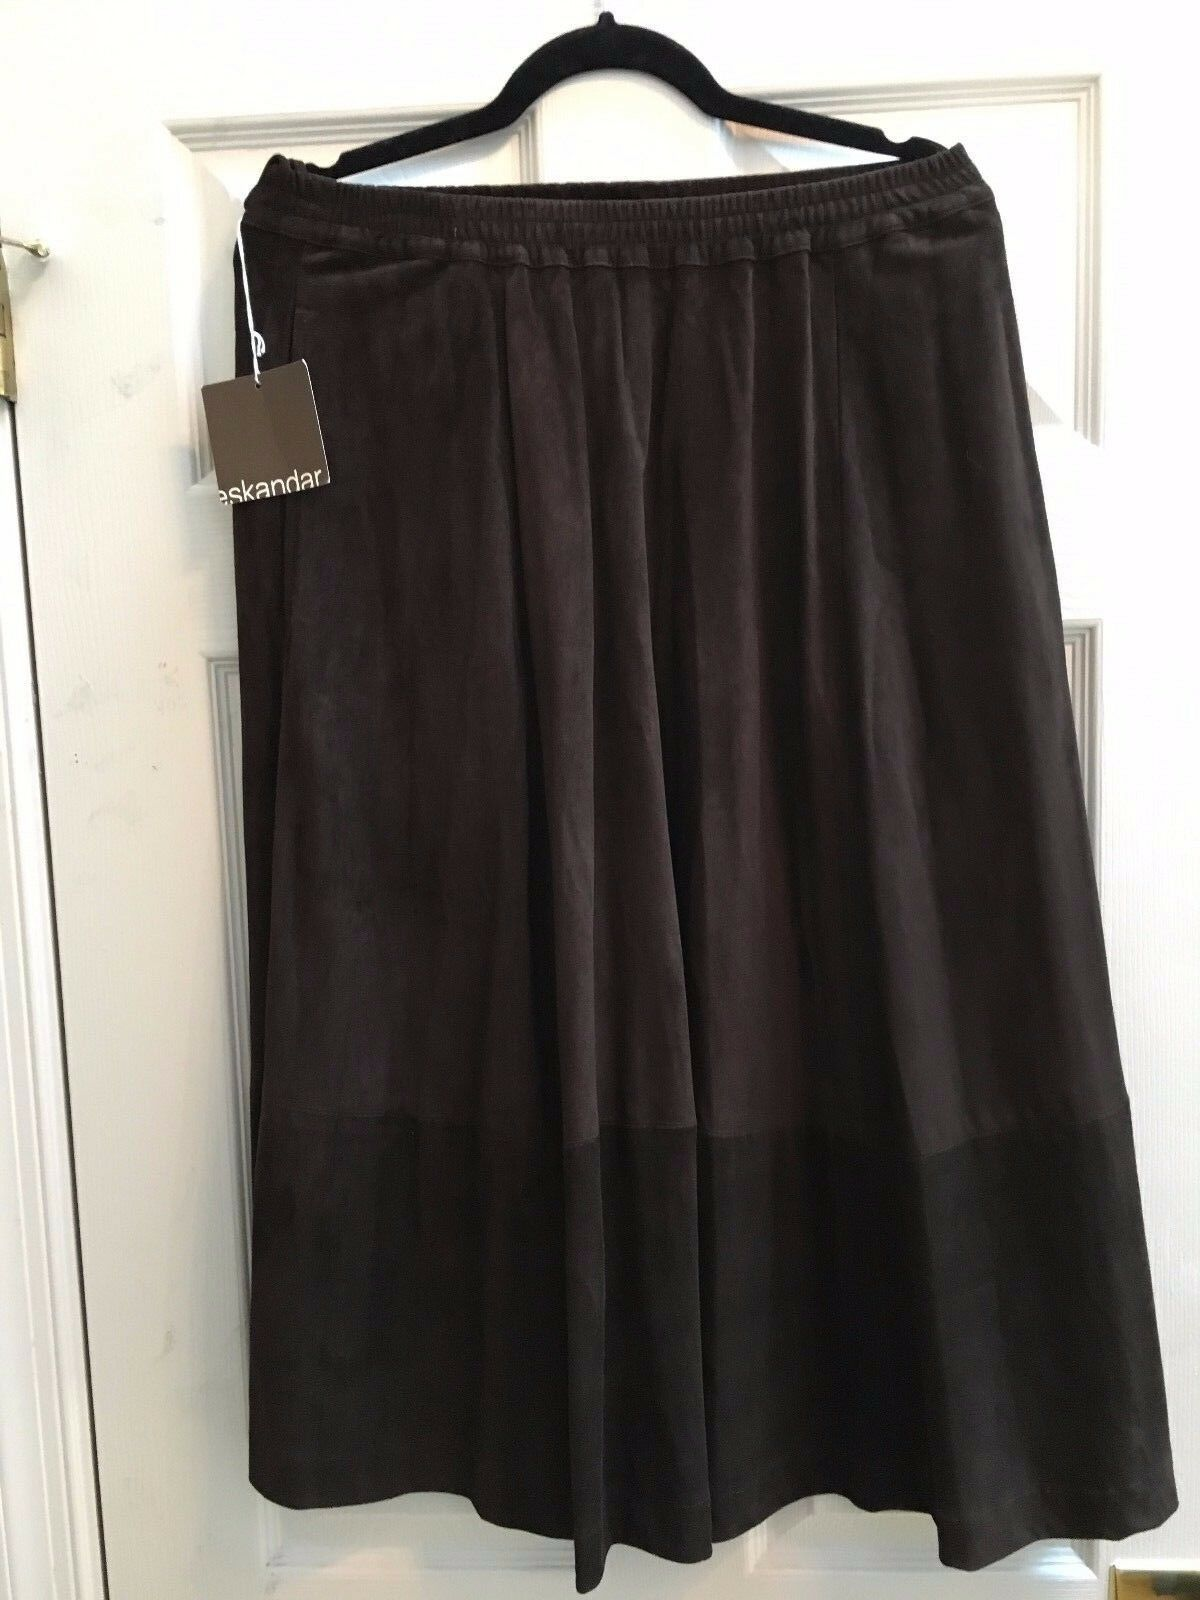 NWT Eskandar Size 0 L XL Brown A Line Suede Skirt